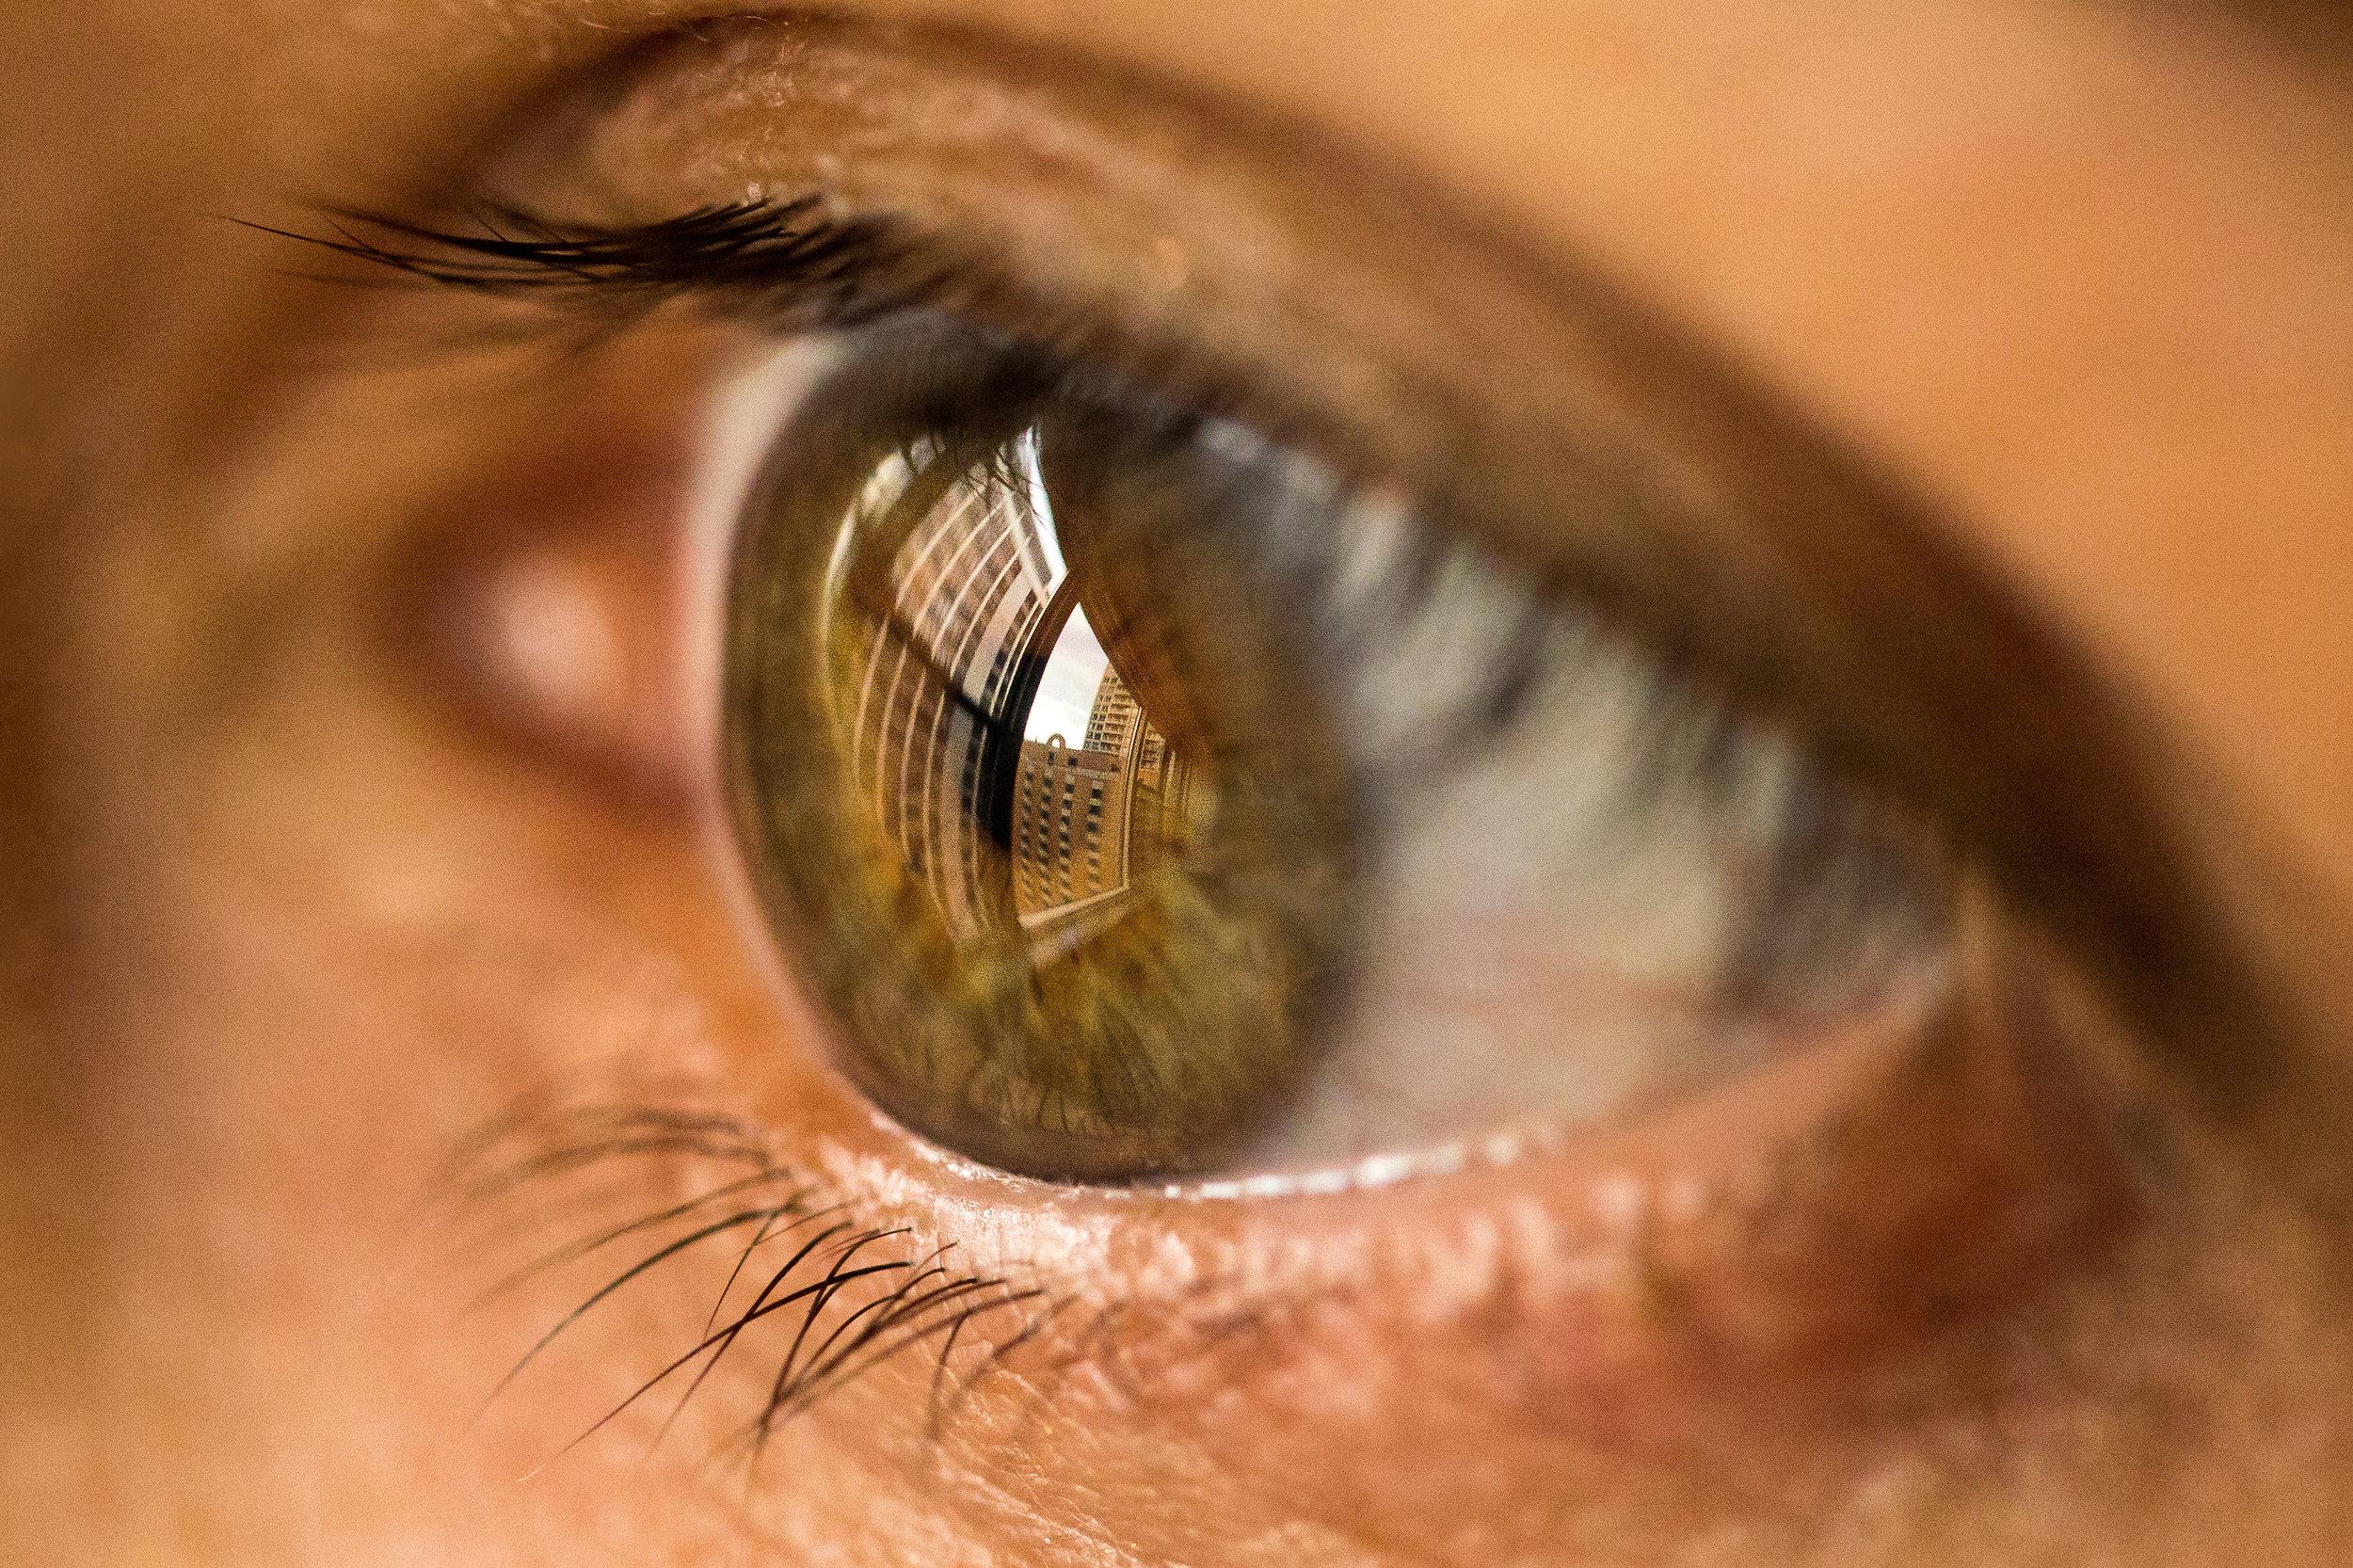 Eye Reflection 1 - Final.jpg